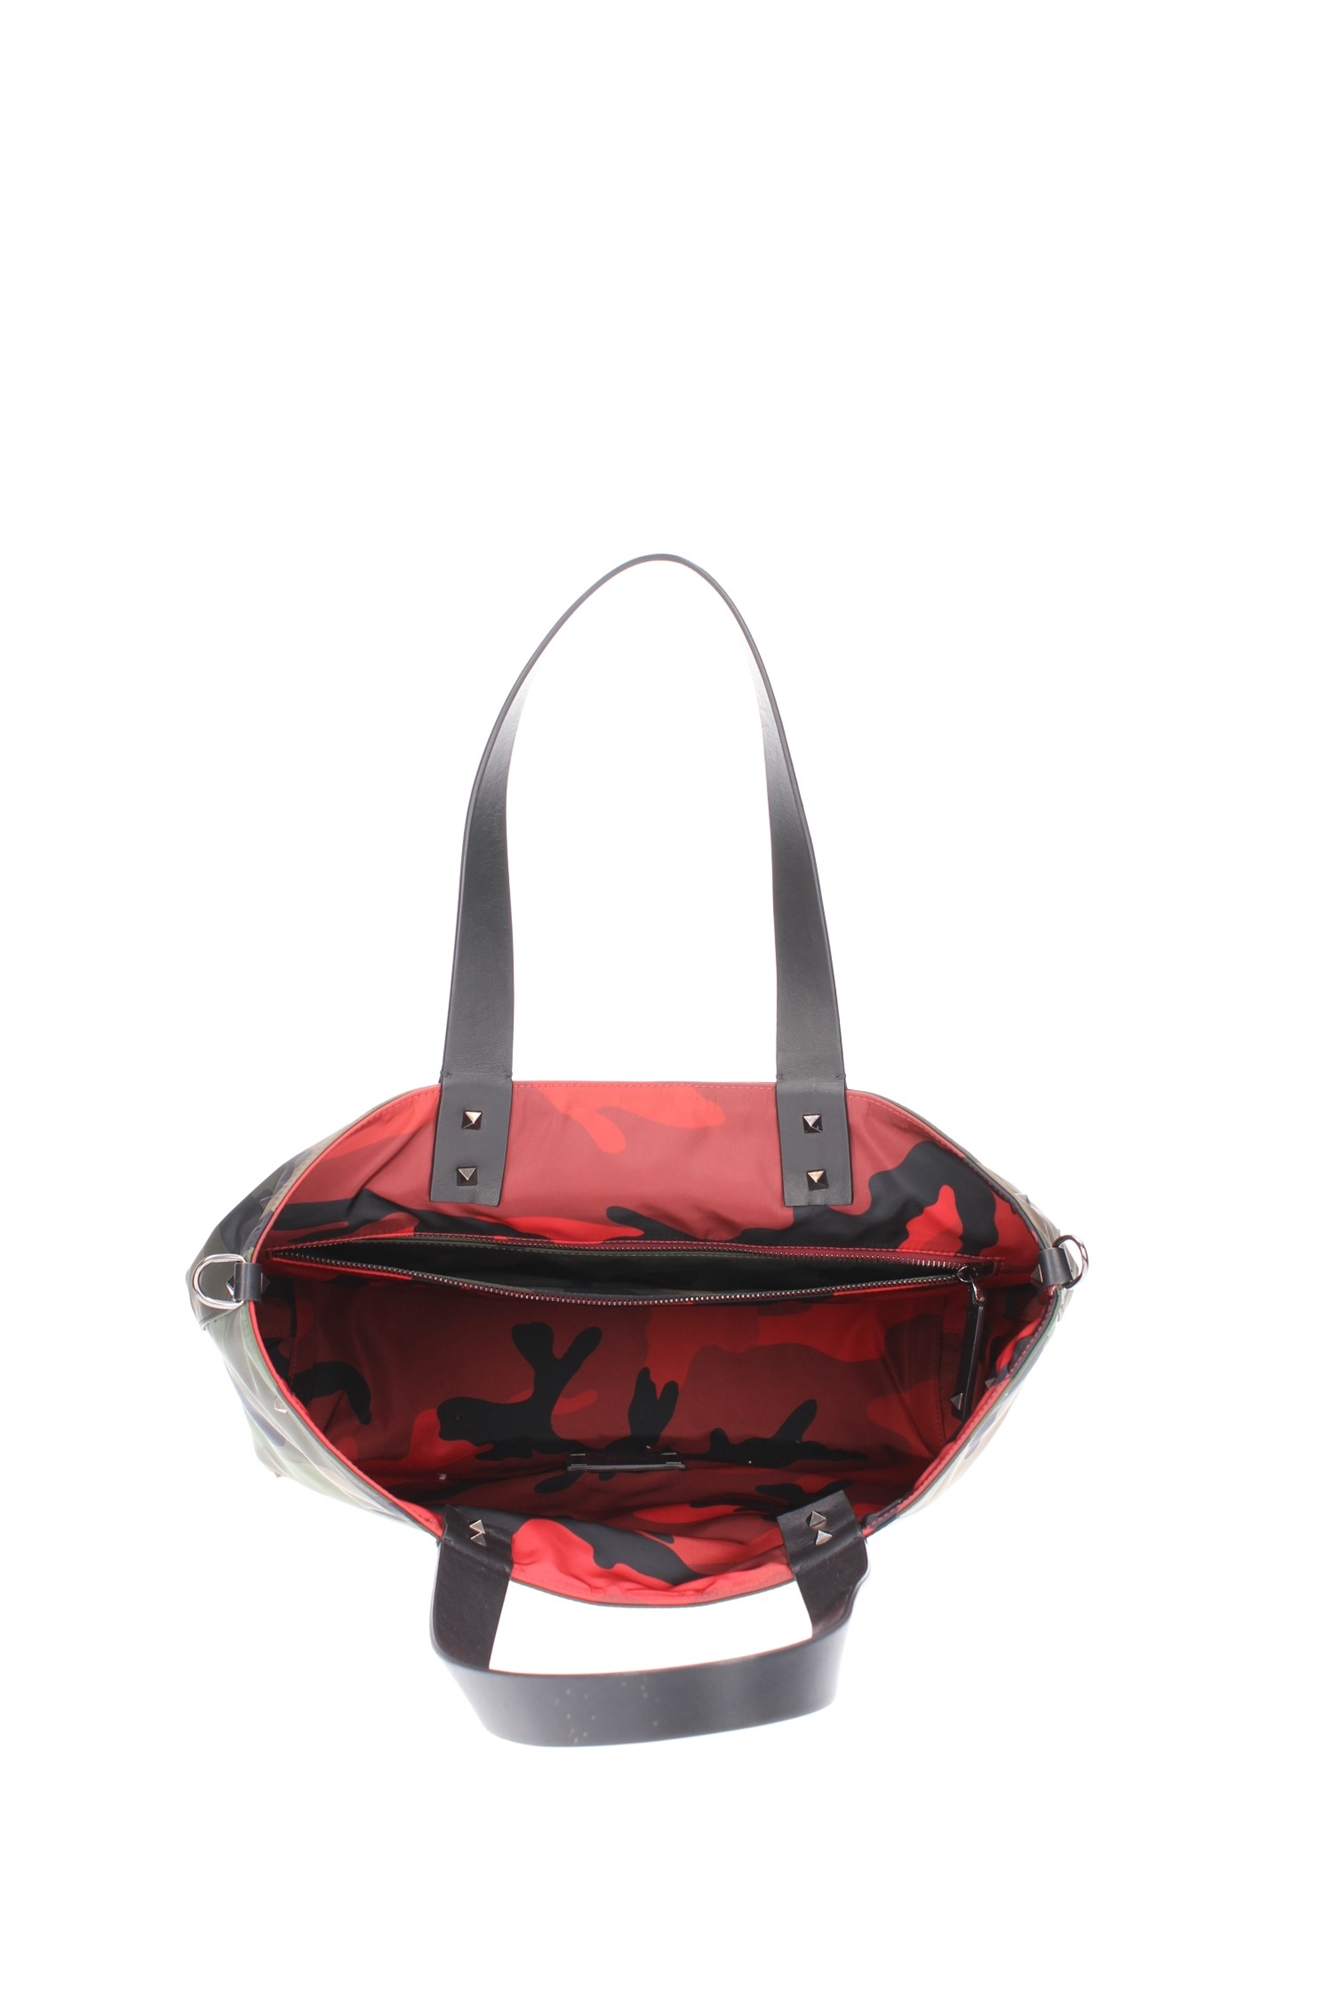 Borse Artigianali Tessuto : Borse ping valentino garavani uomo tessuto rosso